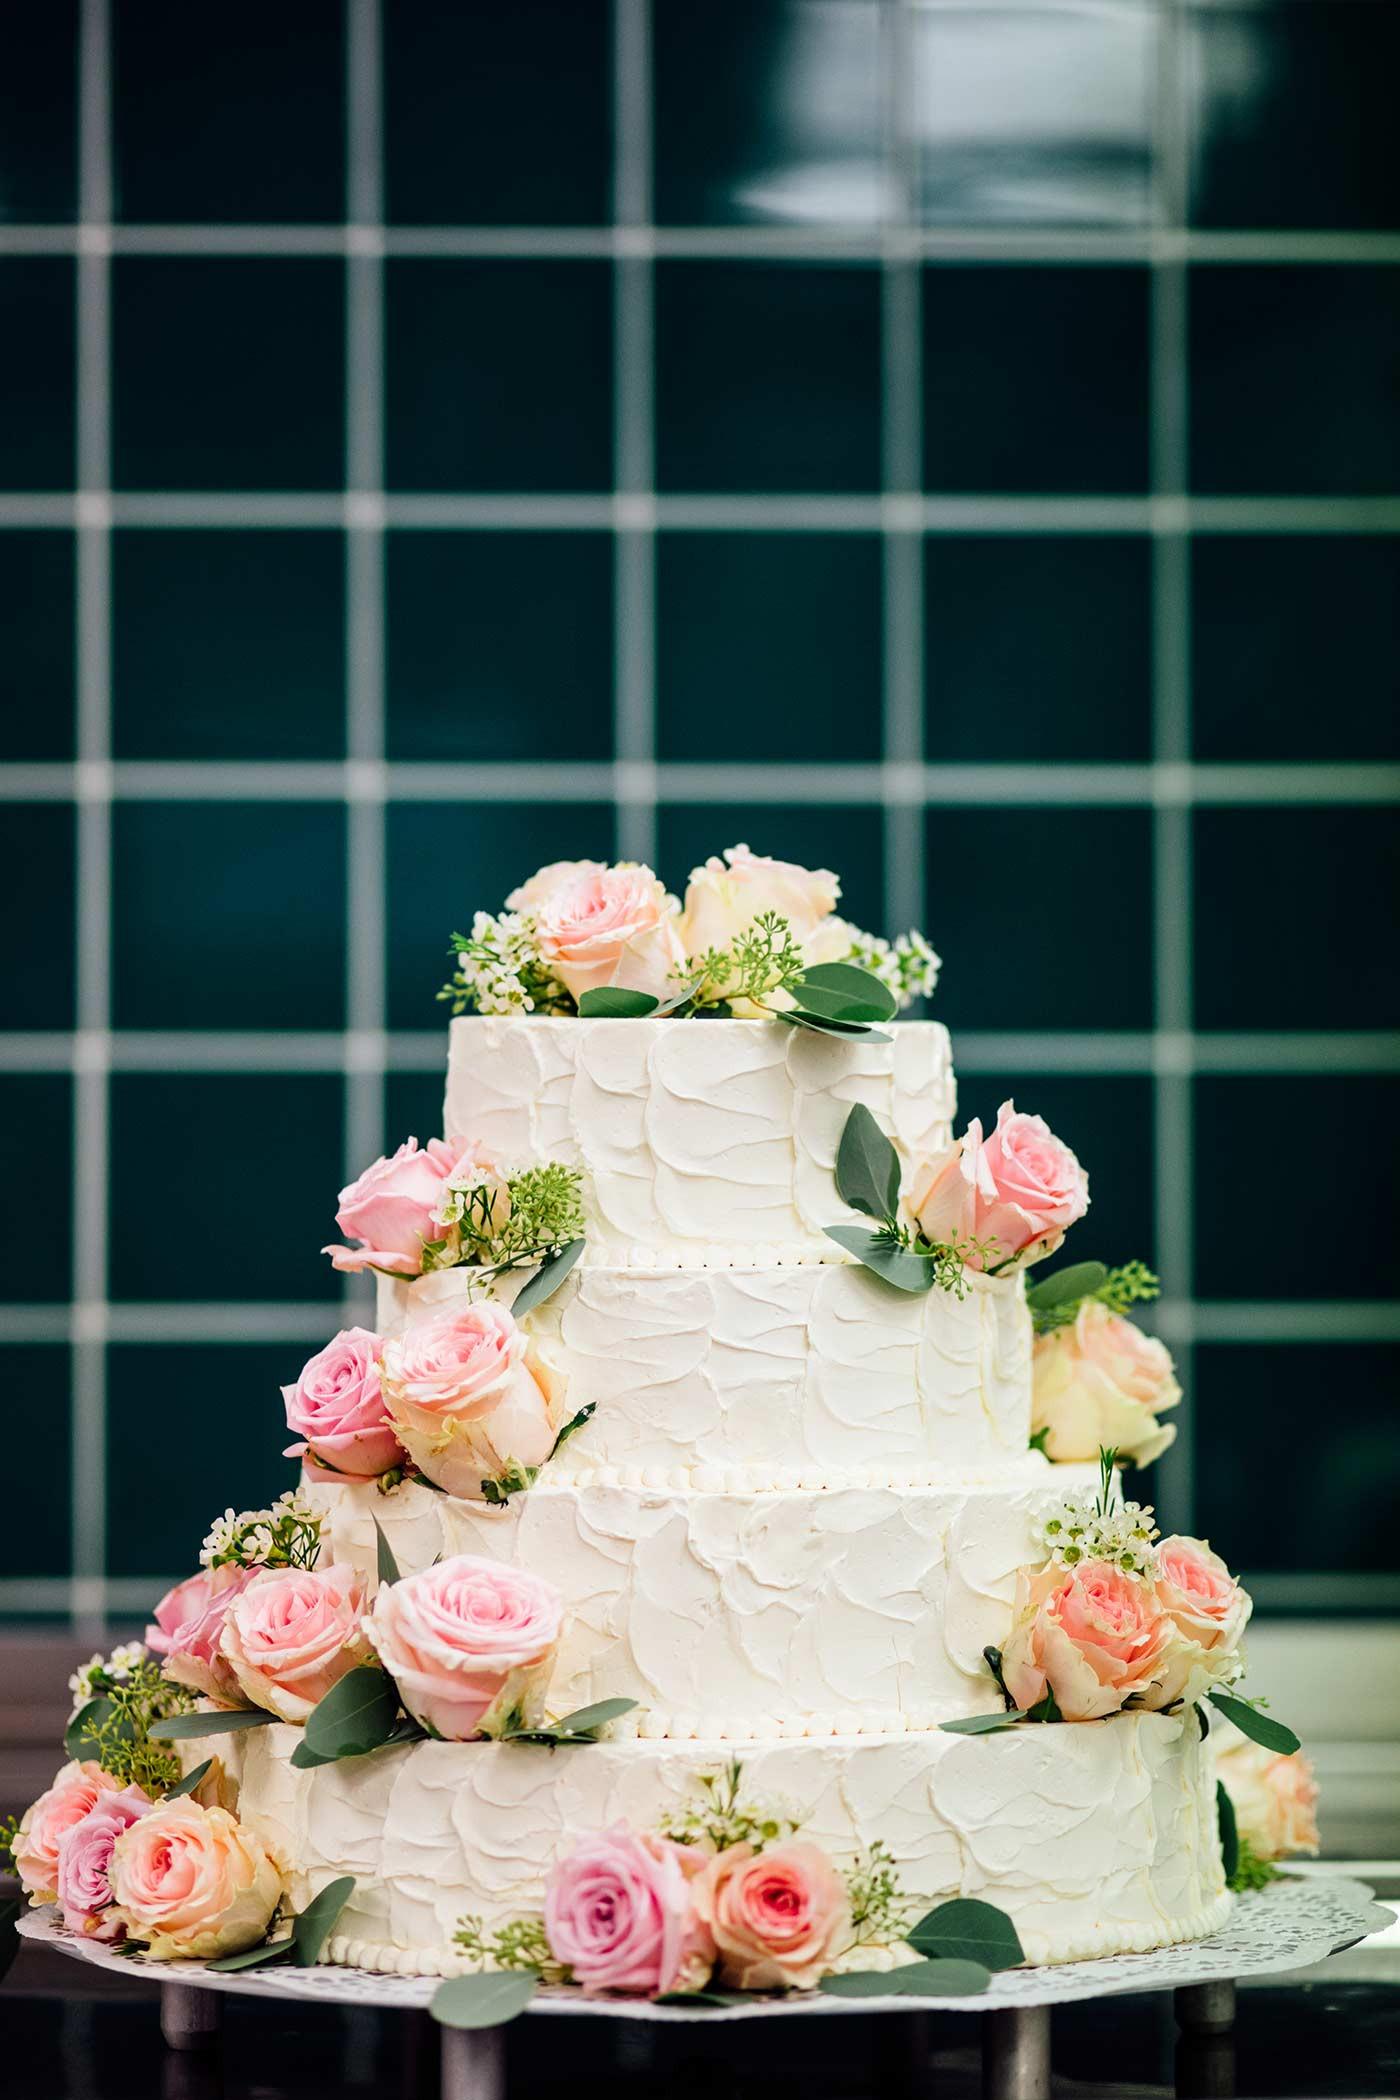 Hochzeitstorte Mit Rosen  Hochzeitstorte mit Rosen